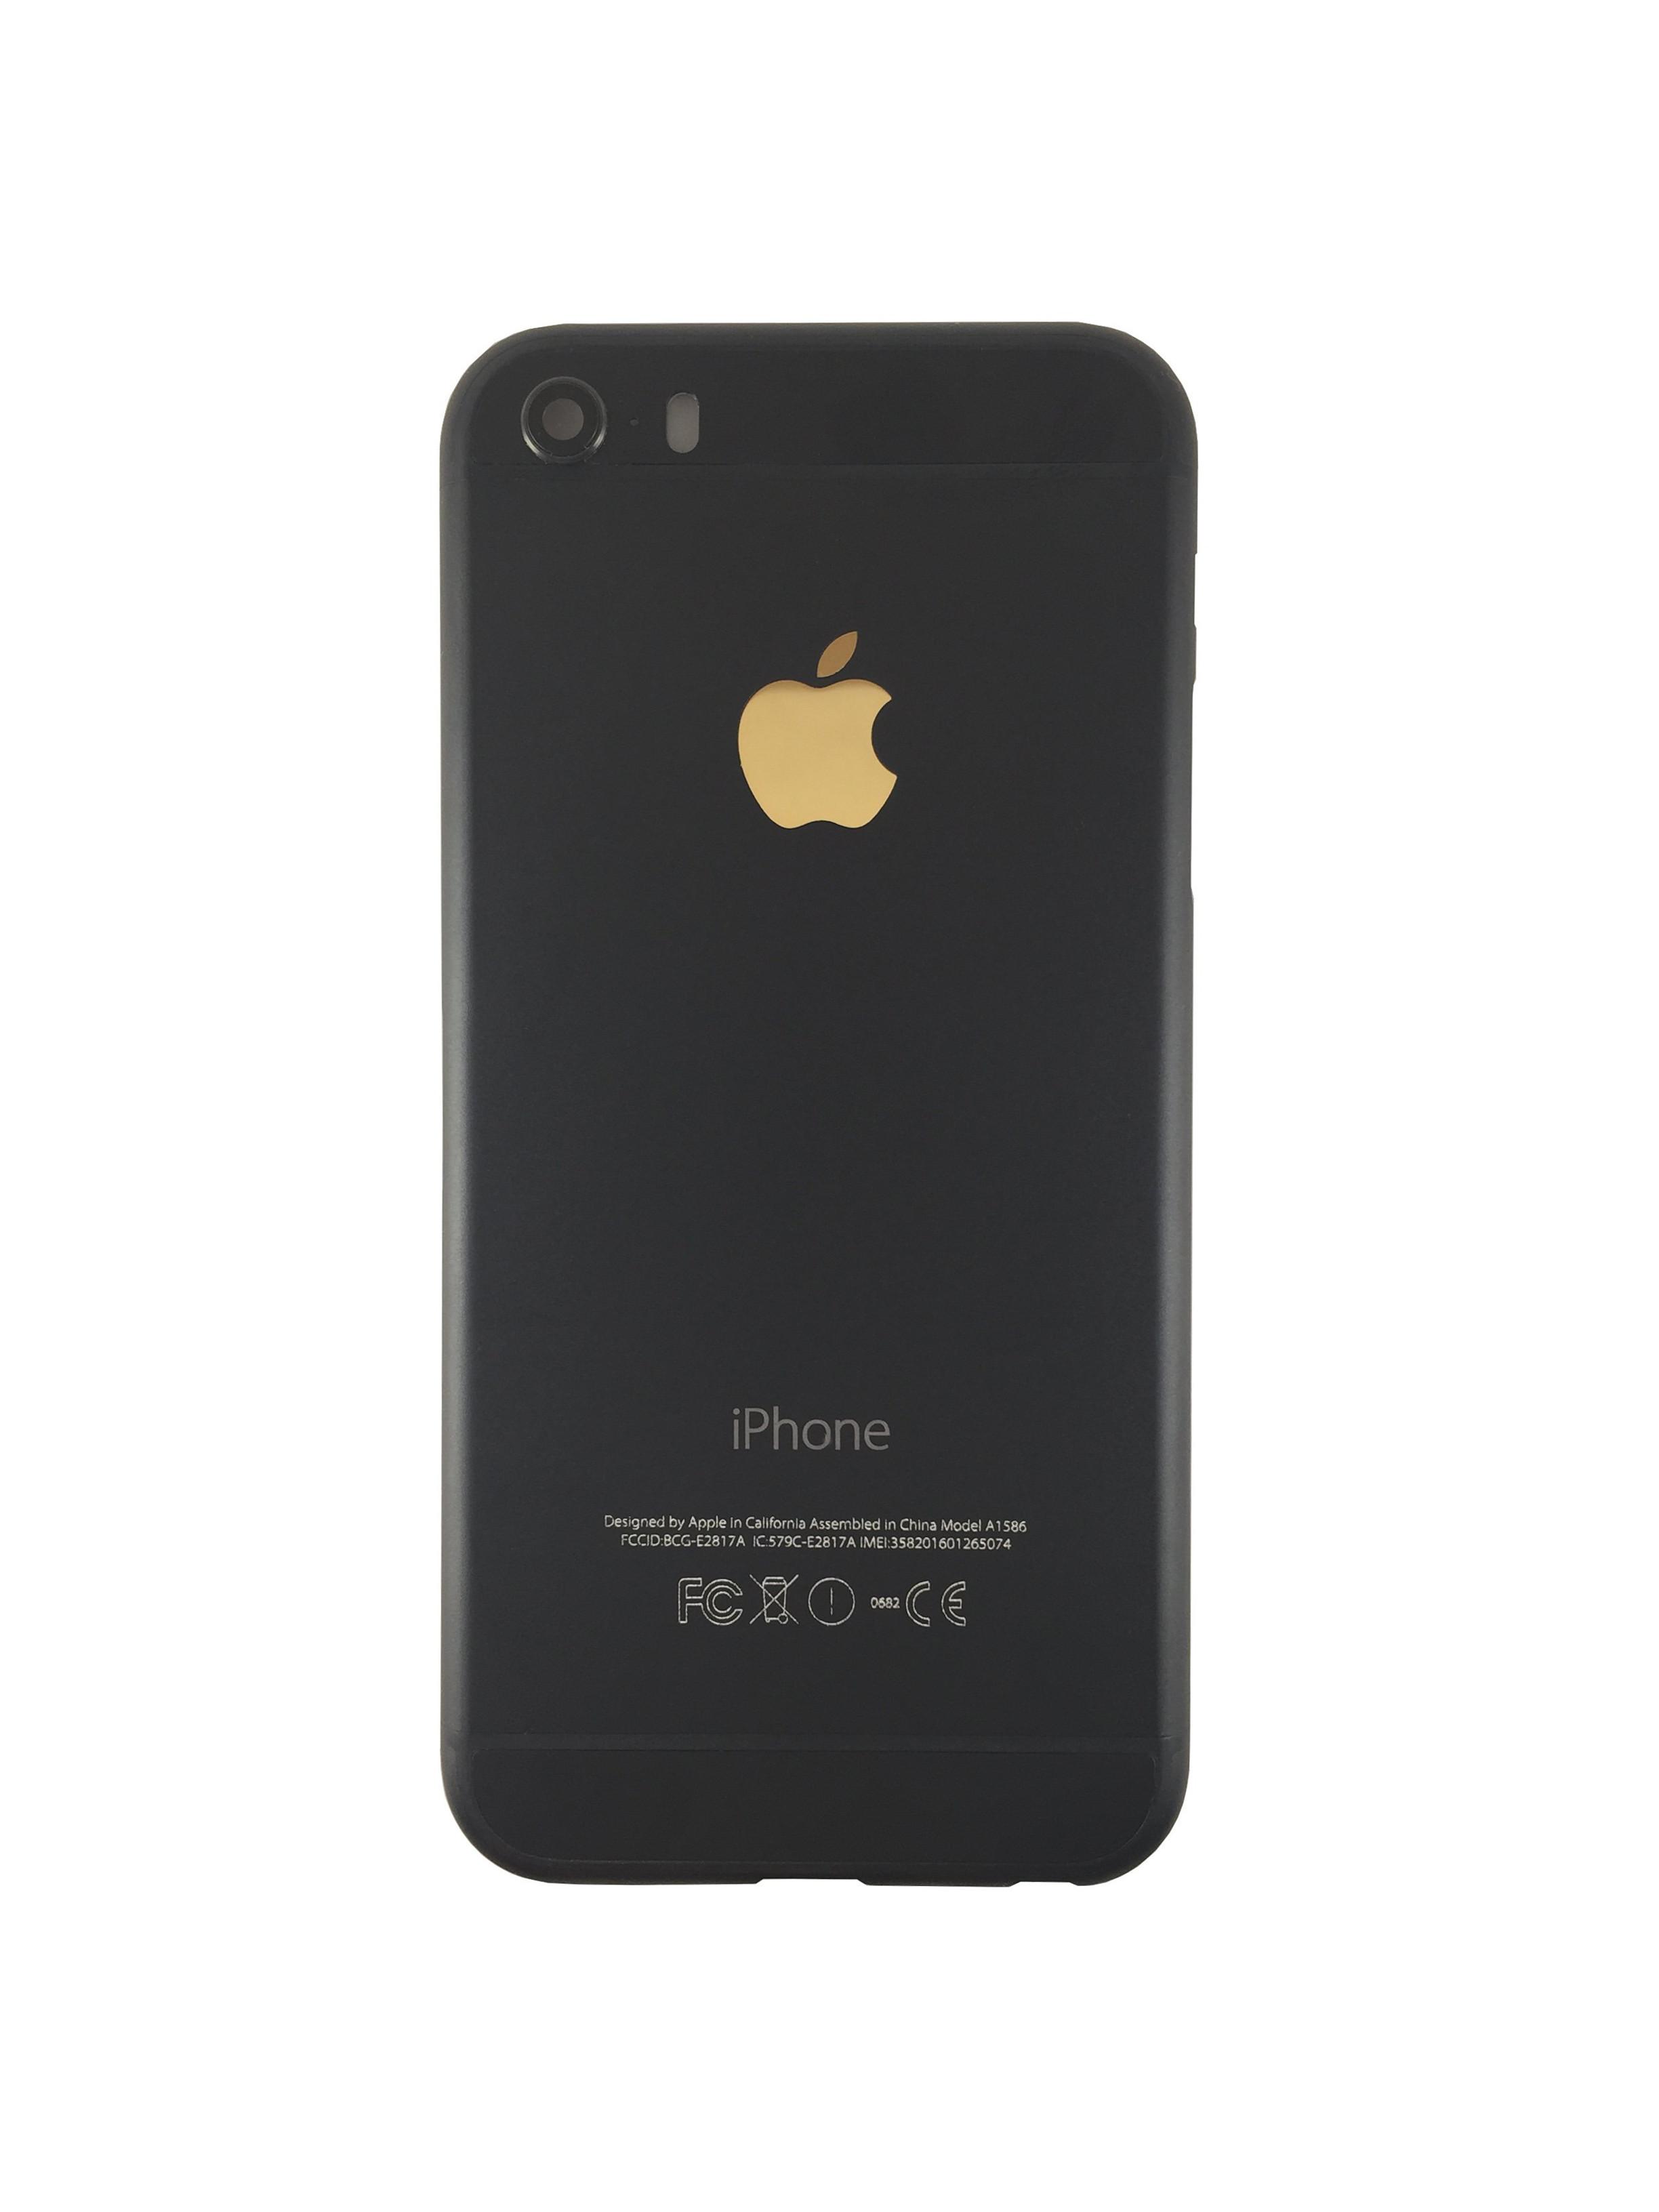 Смена цвета iPhone всех моделей Москва Санкт